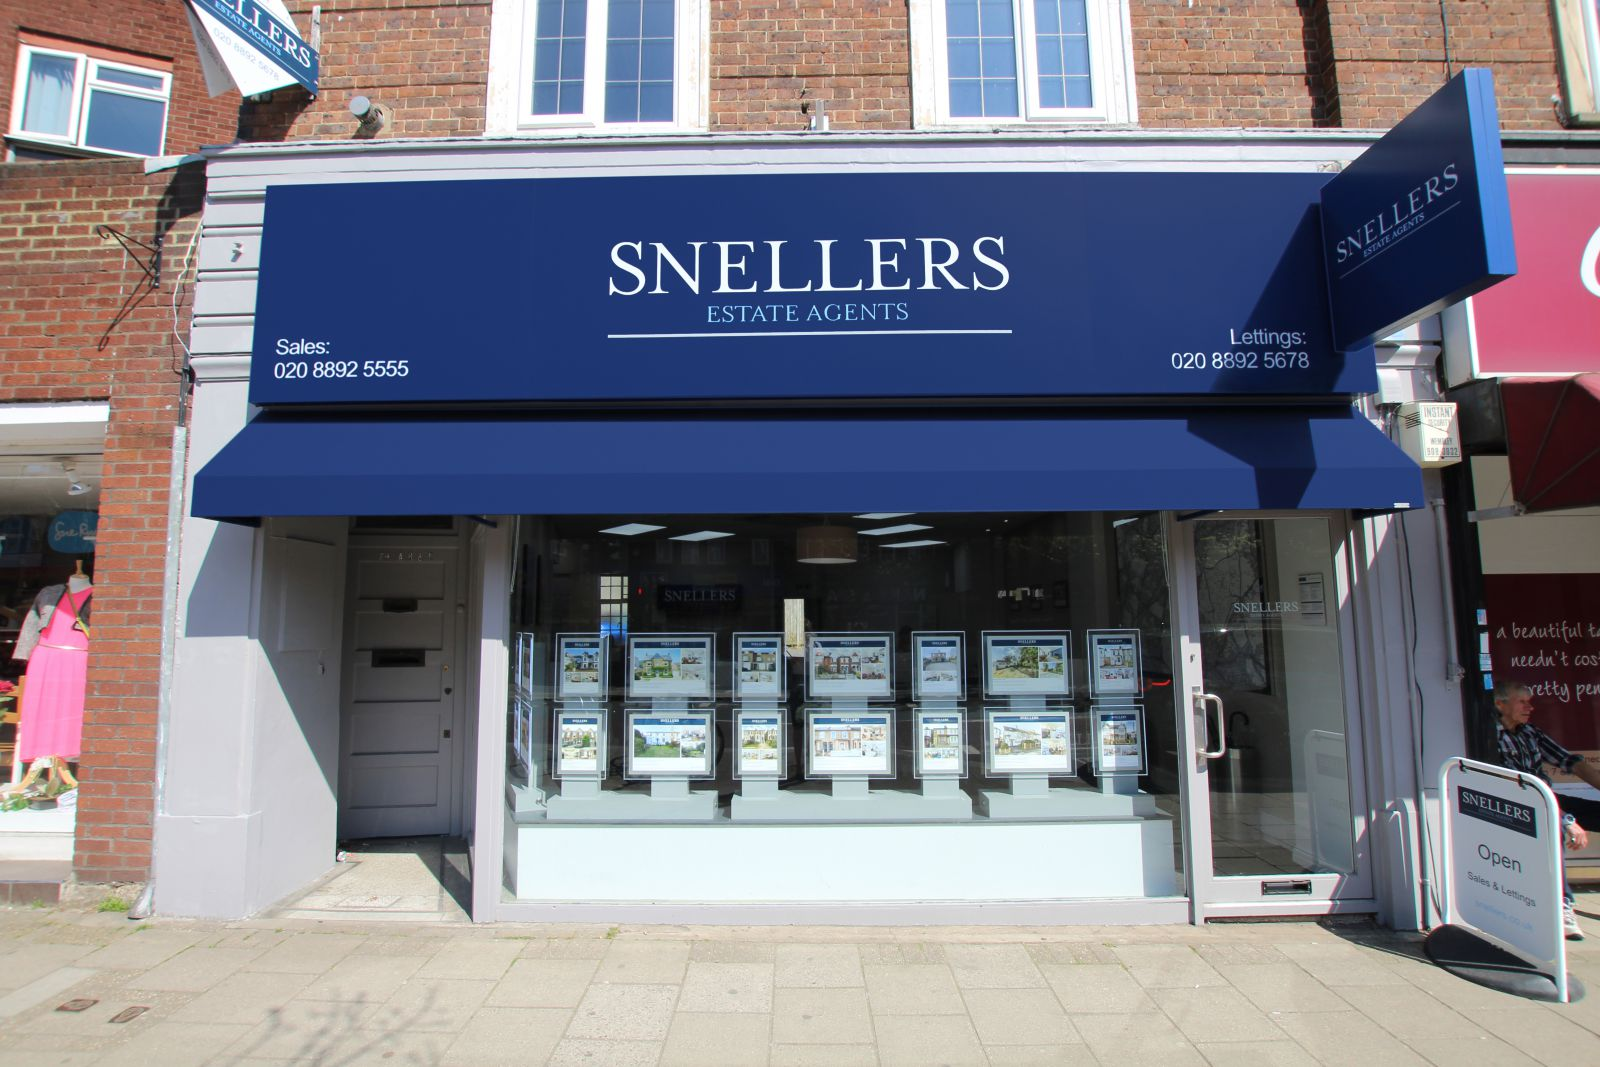 Snellers Twickenham Estate Agents - Twickenham, London TW1 4BW - 020 8892 5555 | ShowMeLocal.com